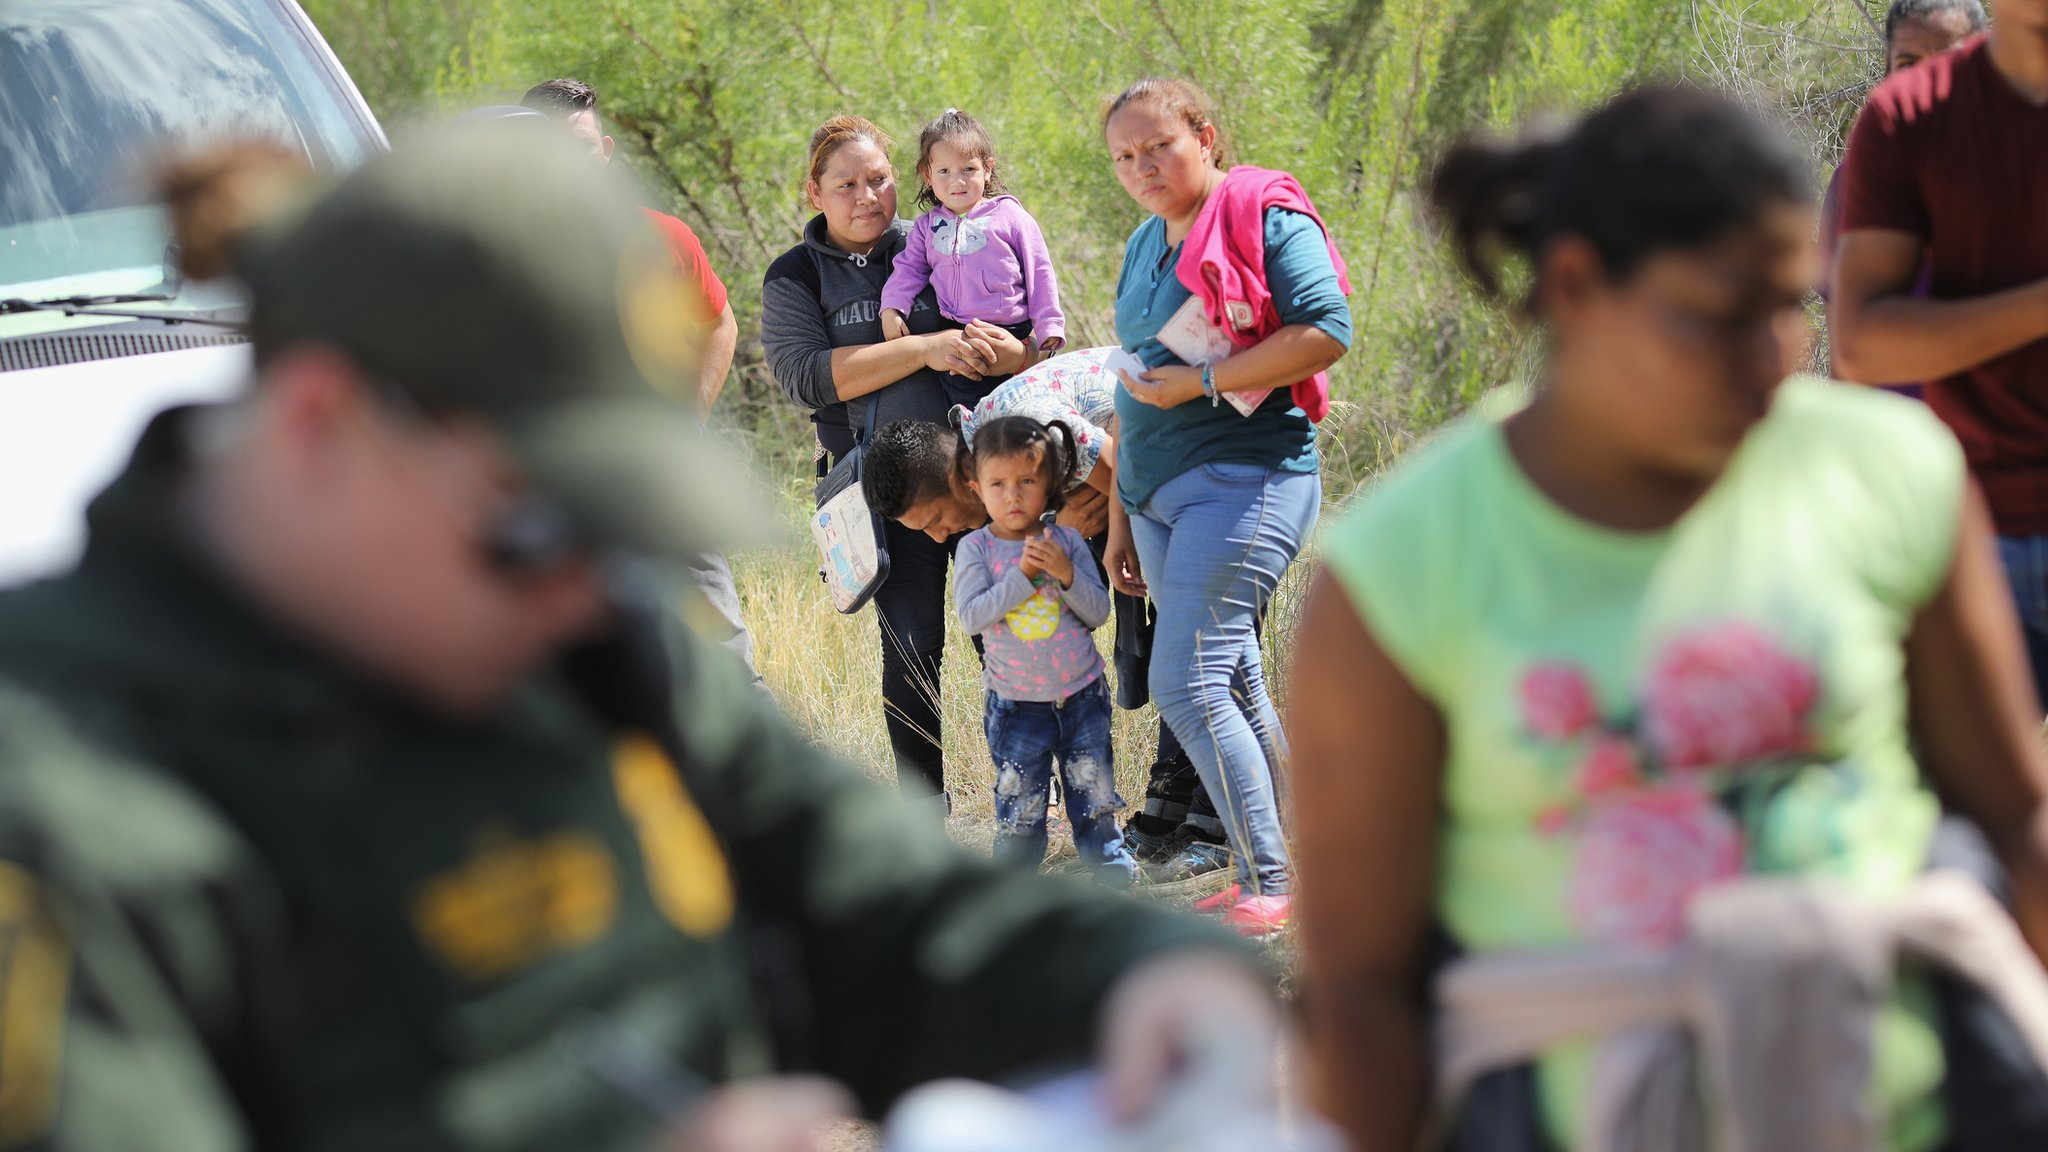 Migrant family separations: Republicans scramble as border crisis grows | BBC